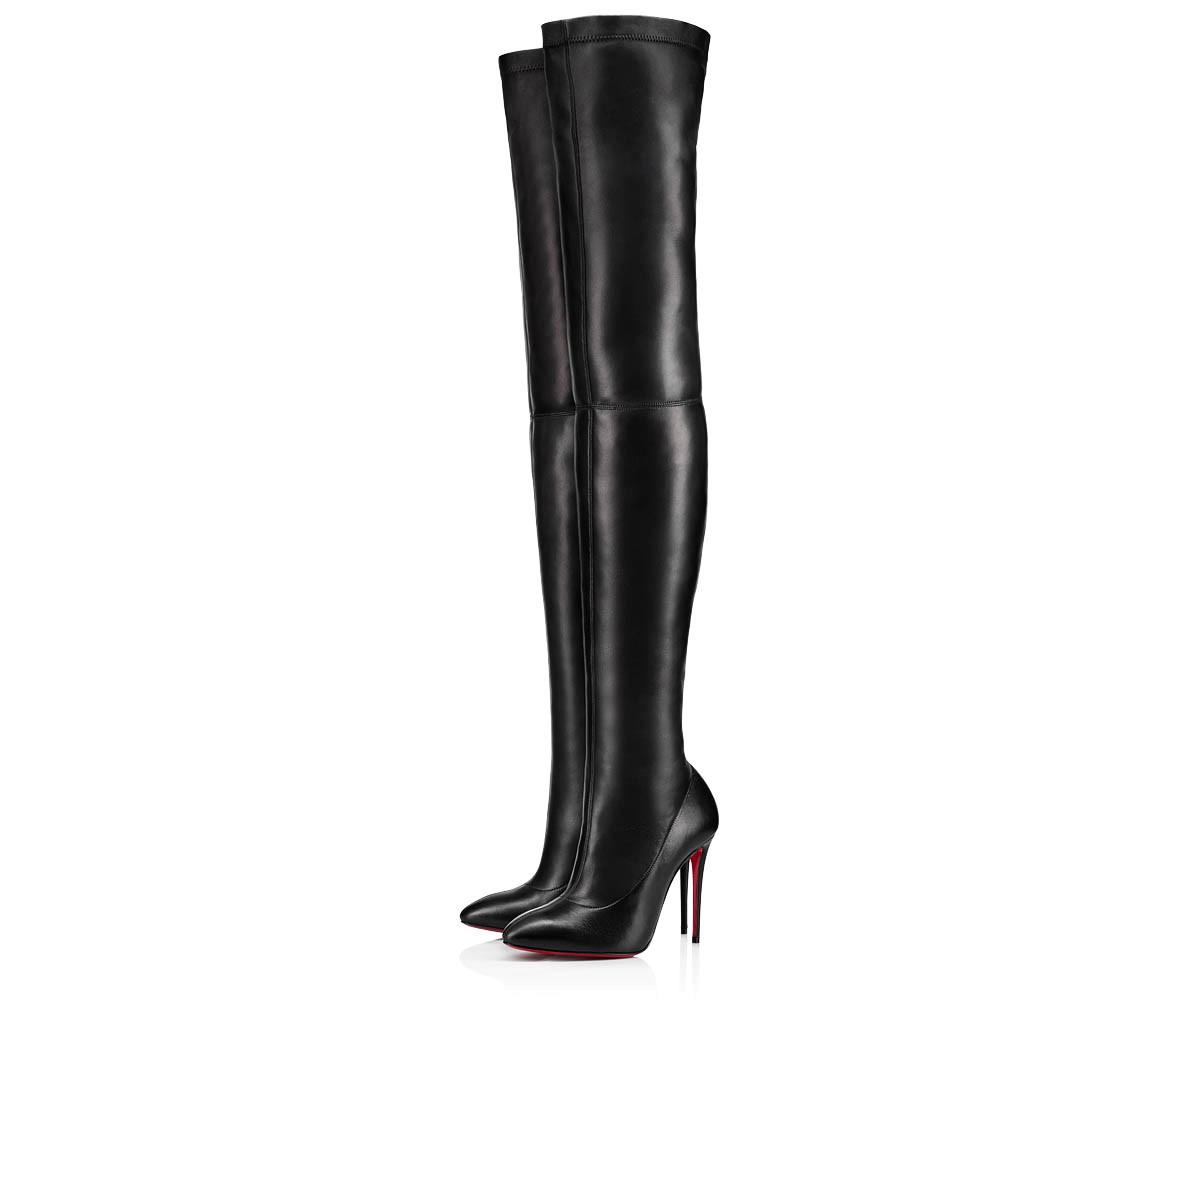 d22288bb9f4 ELOUIX 100 Black Leather - Women Shoes - Christian Louboutin